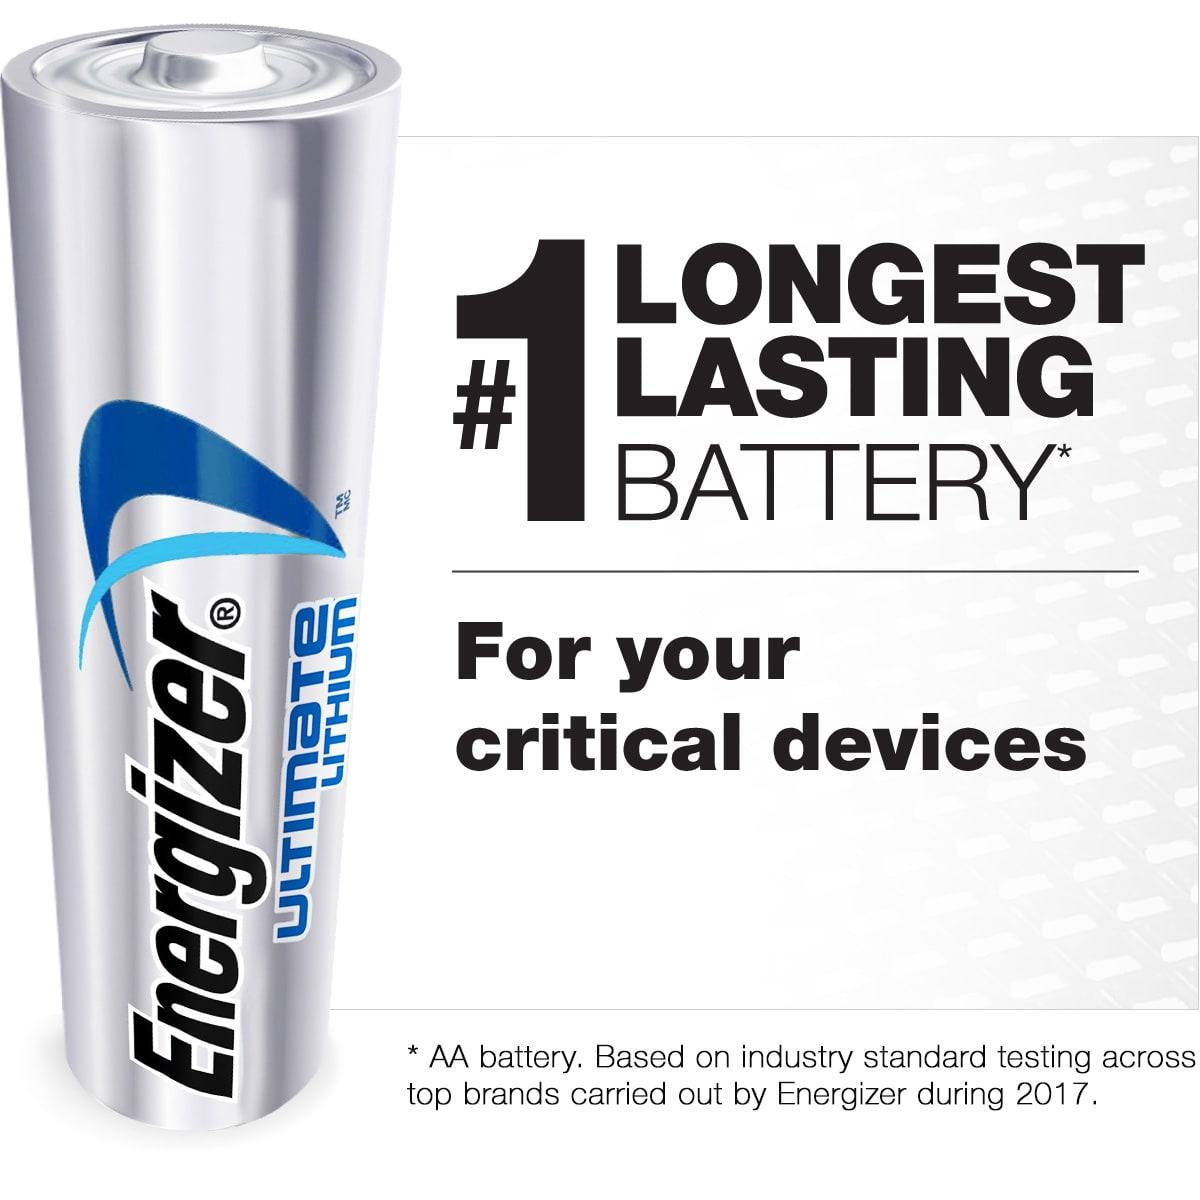 Energizer Rechargeable D Cell Batteries, NiMH D Battery (2